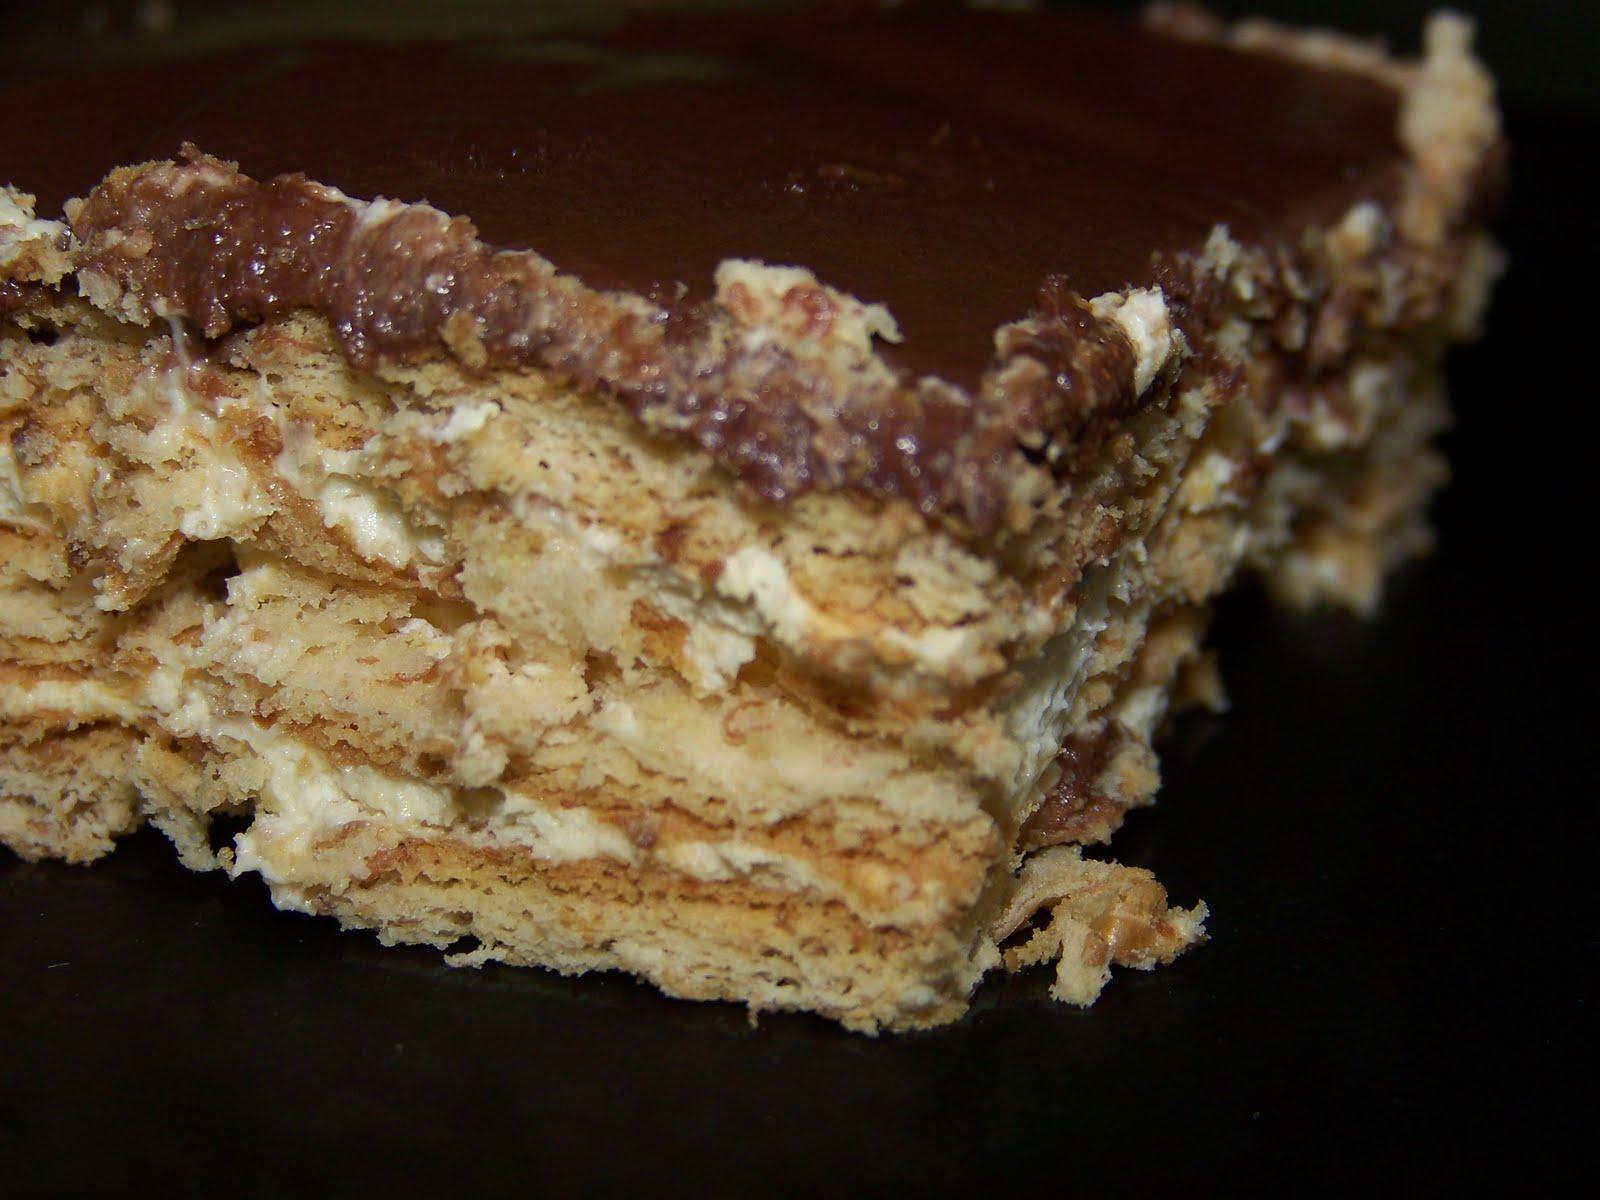 Stefanies Cooking Spot: Chocolate Éclair Dessert